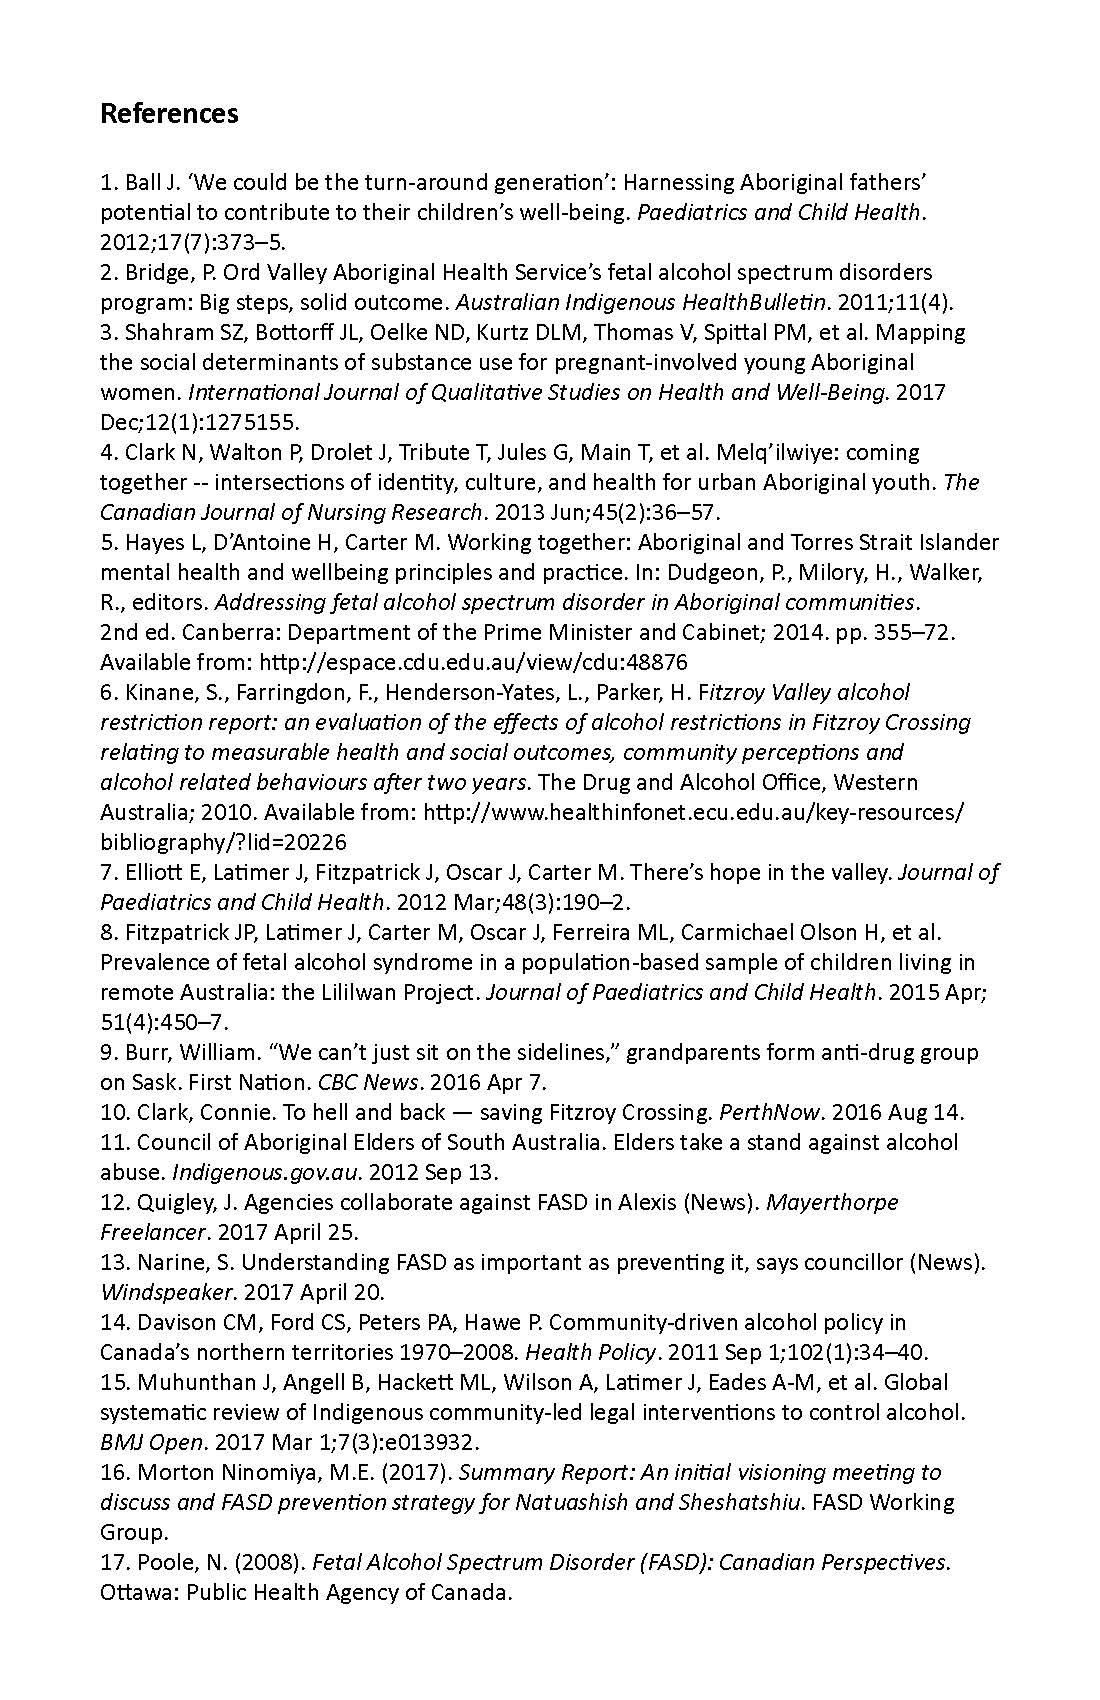 Indig-FASD-COMMUNITY-ACTION_Jan2018_Page_19